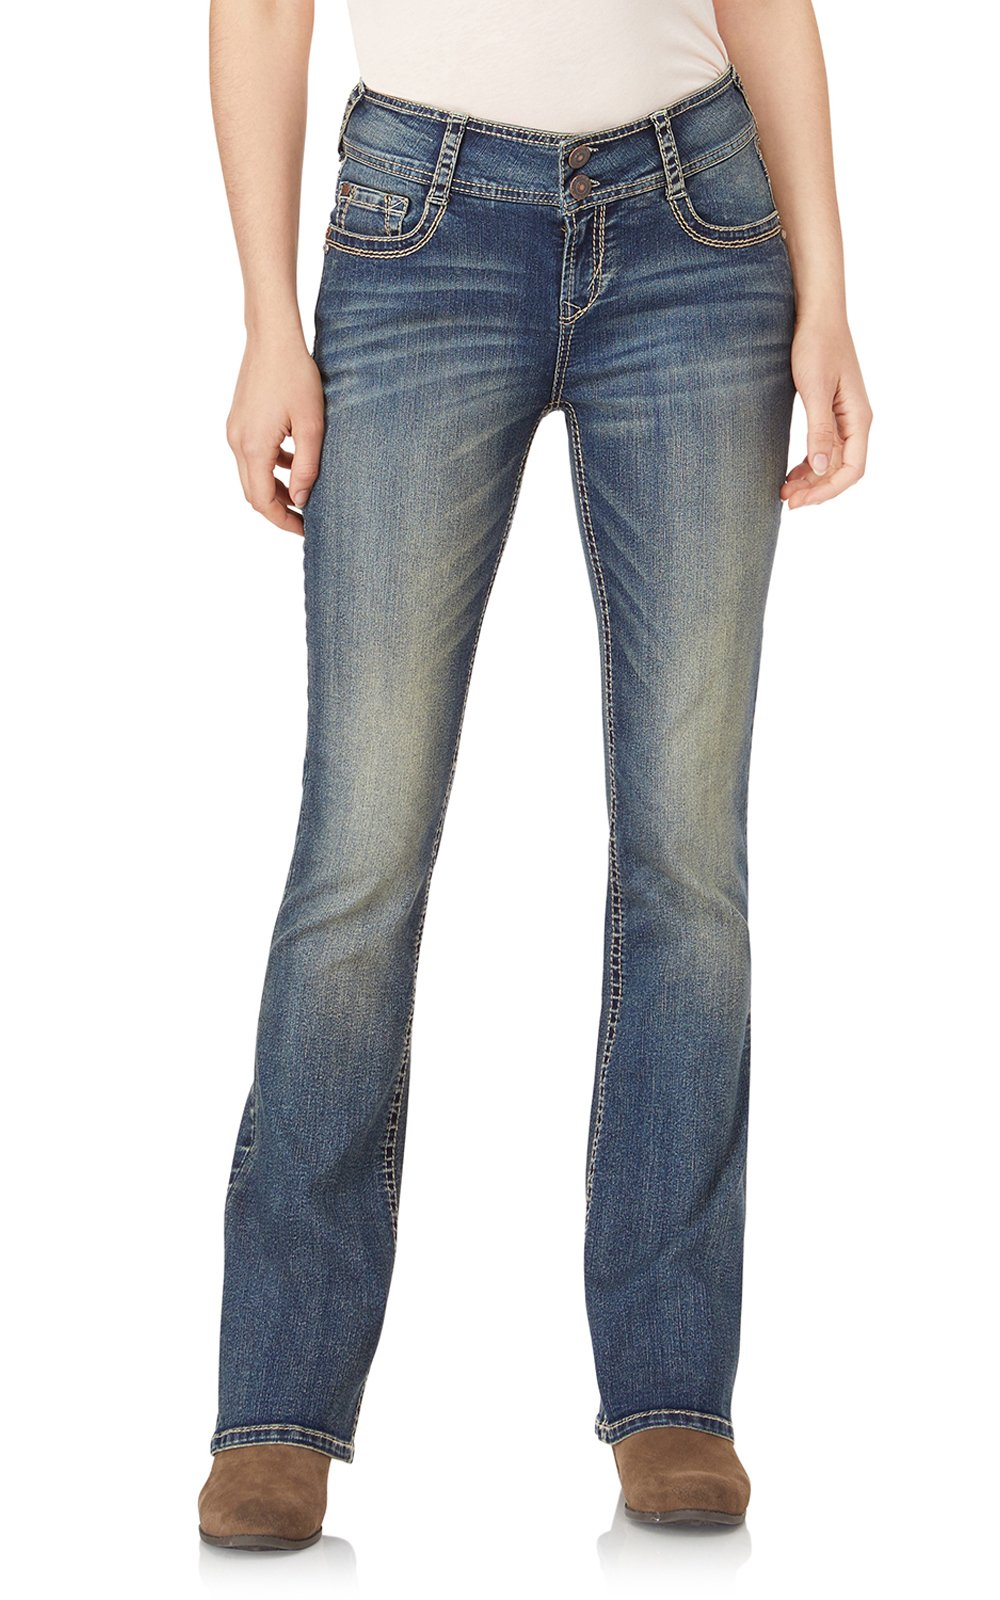 WallFlower Jeans Junior's Petite InstaStretch Luscious Curvy Bootcut, Basil, 3 Short by WallFlower (Image #1)